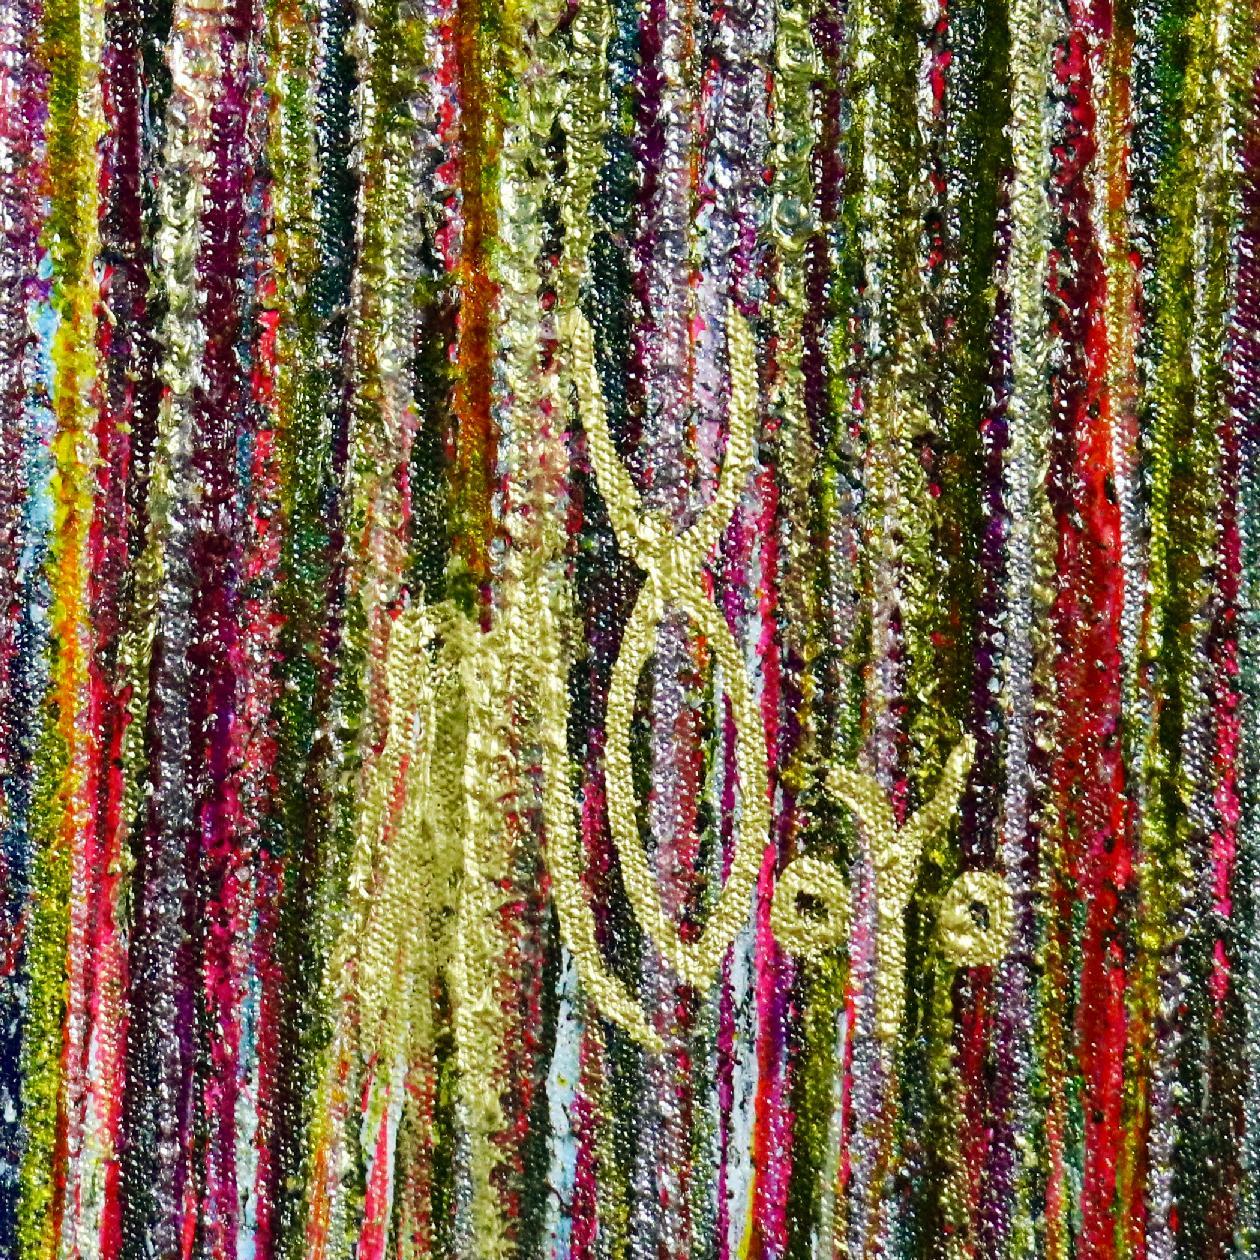 SOLD - Signature - A closer look (Luminance garden) 2 Painting by Nestor Toro